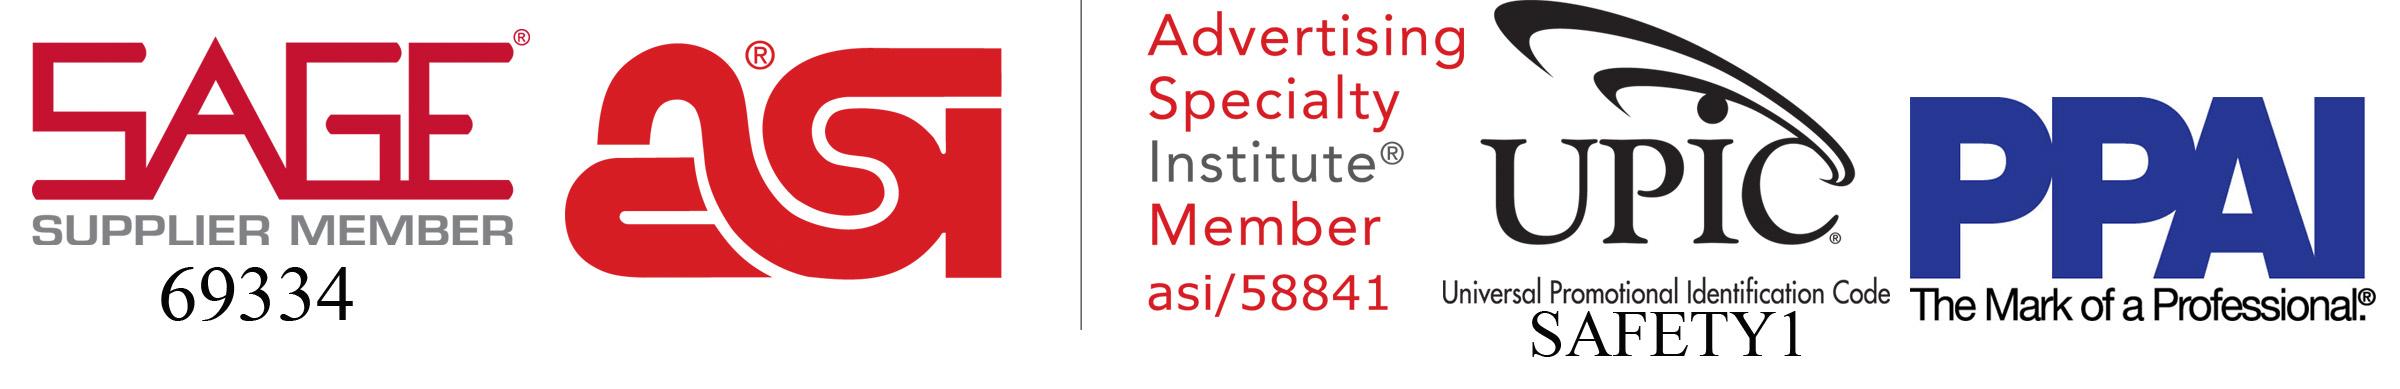 promotional-affilations.jpg